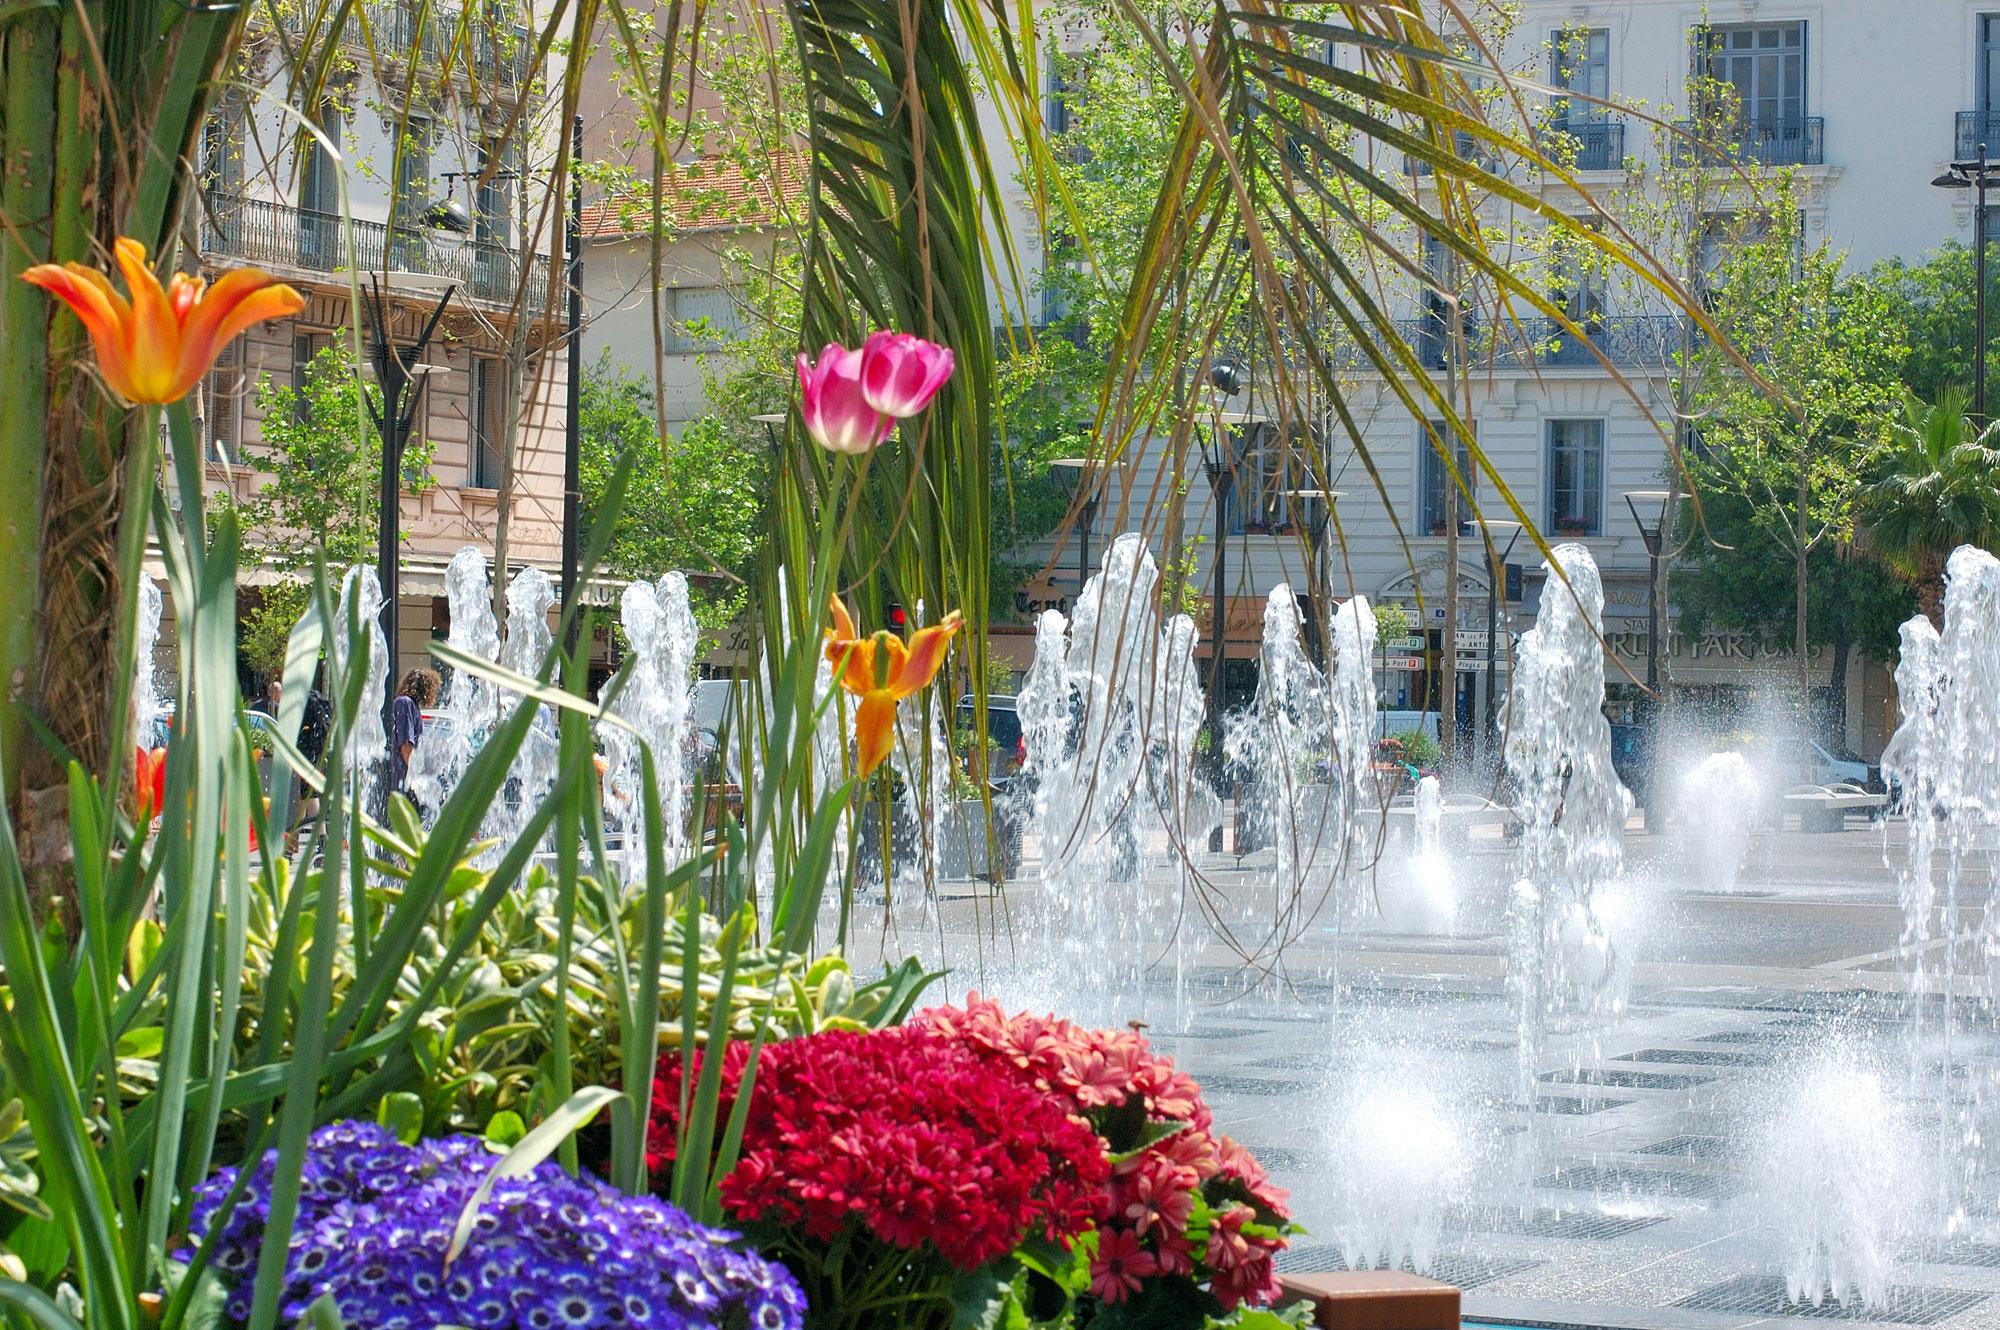 A Luxury Weekend Break On The Fabulous French Riviera – Part 1